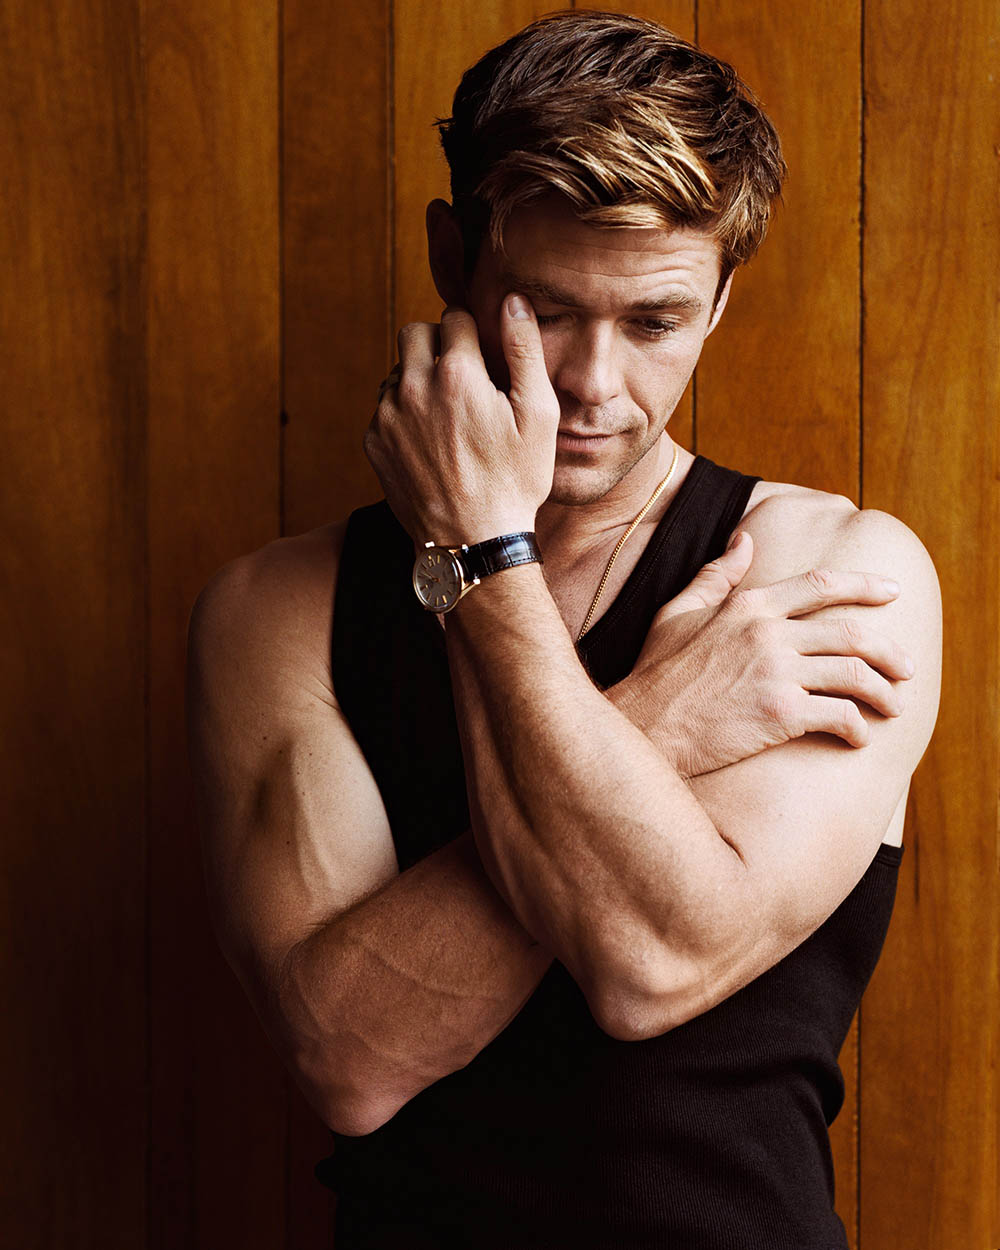 Chris Hemsworth covers GQ USA September 2018 by Alasdair McLellan